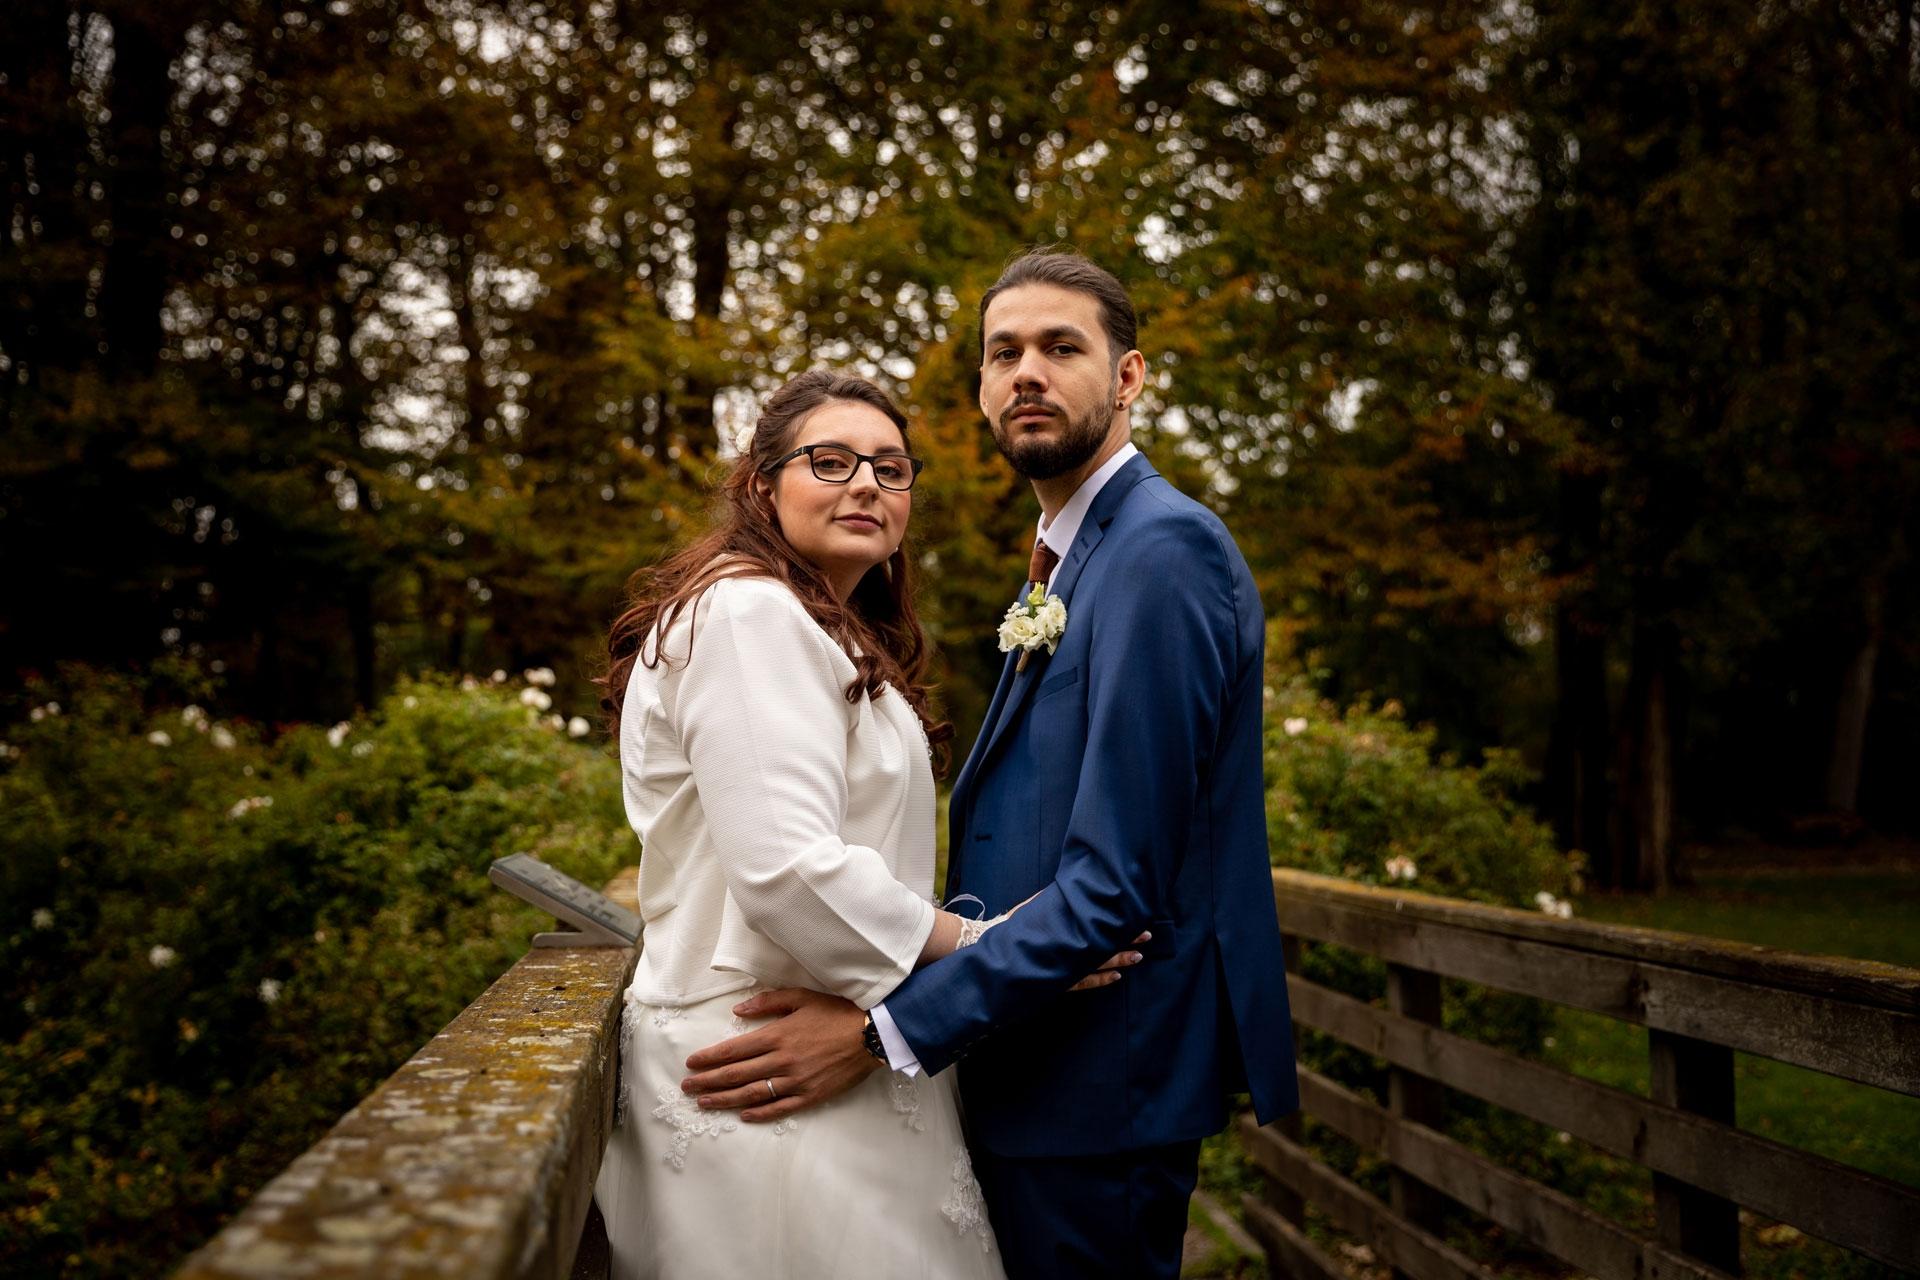 20201017-mariage-justine-alexandre-42